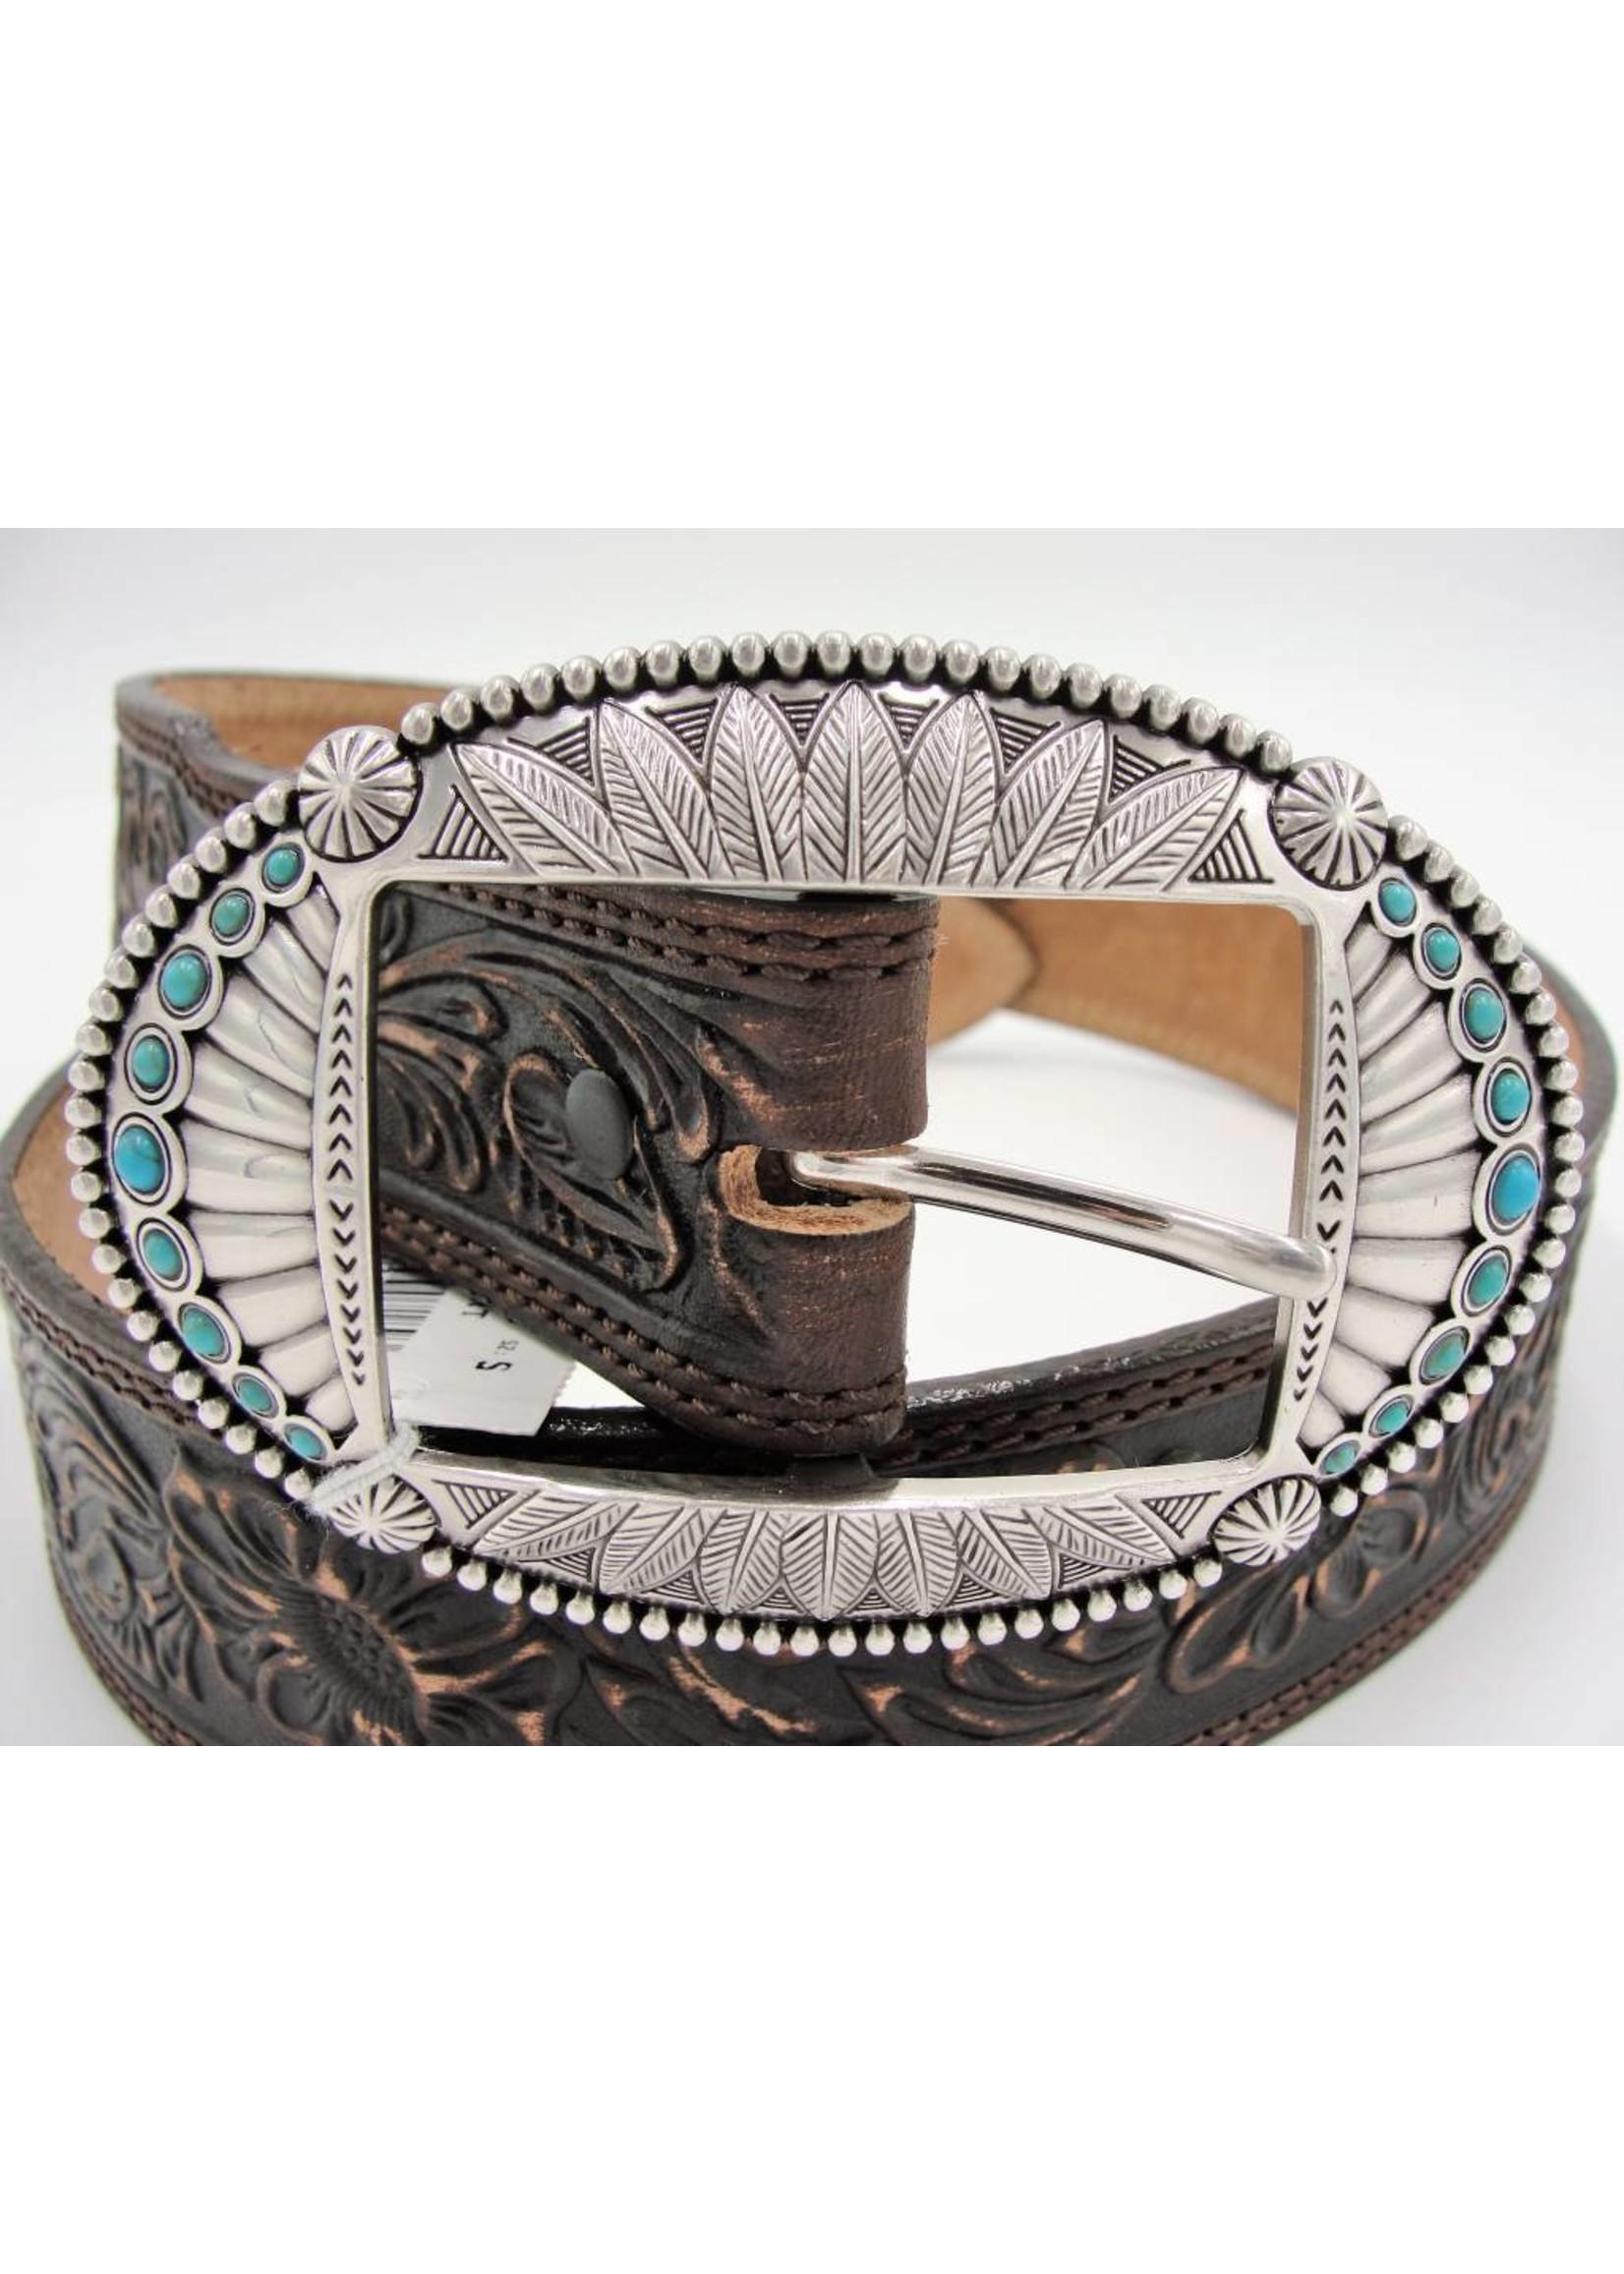 Justin Justin Women's Native Spirit Belt C21455